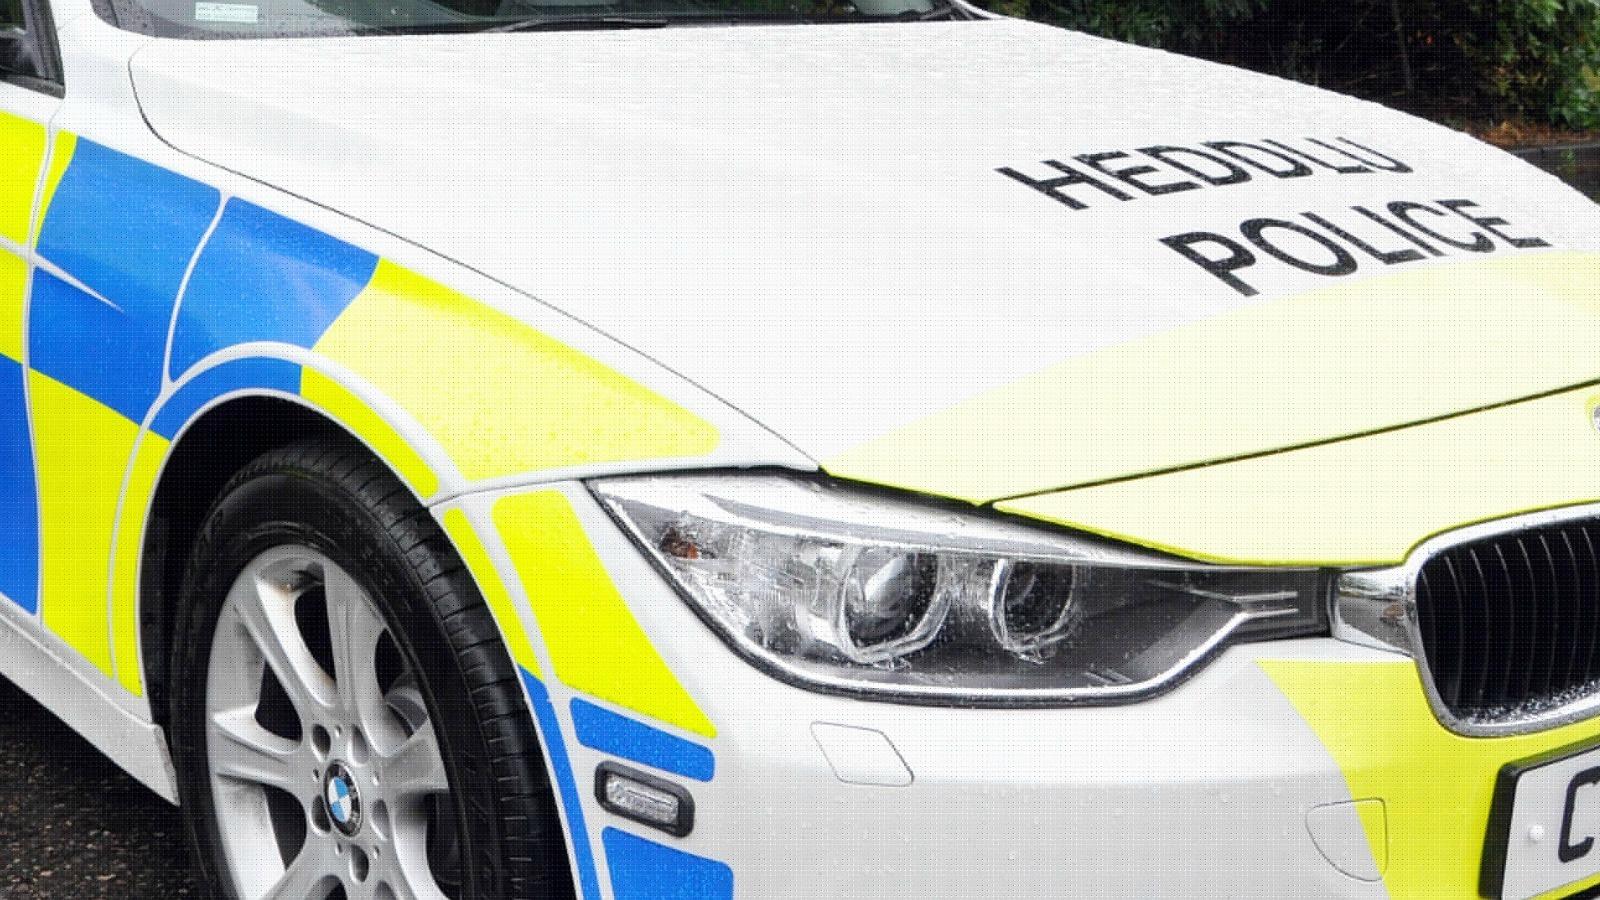 Car overturned near Northop Hall